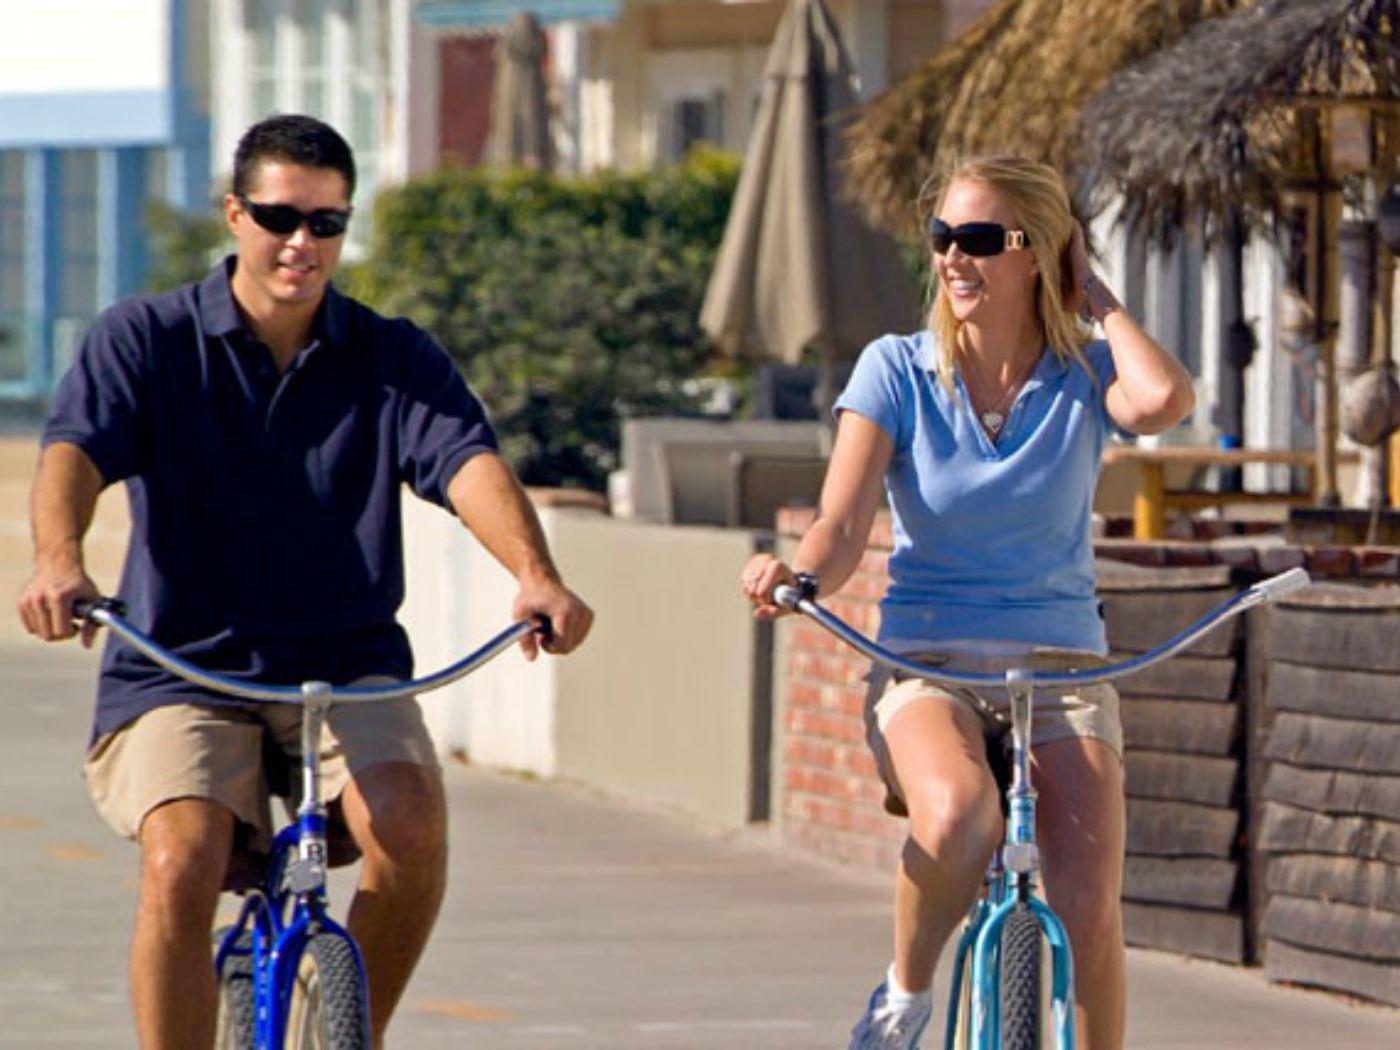 Hyatt Regency Newport Beach bike rentals